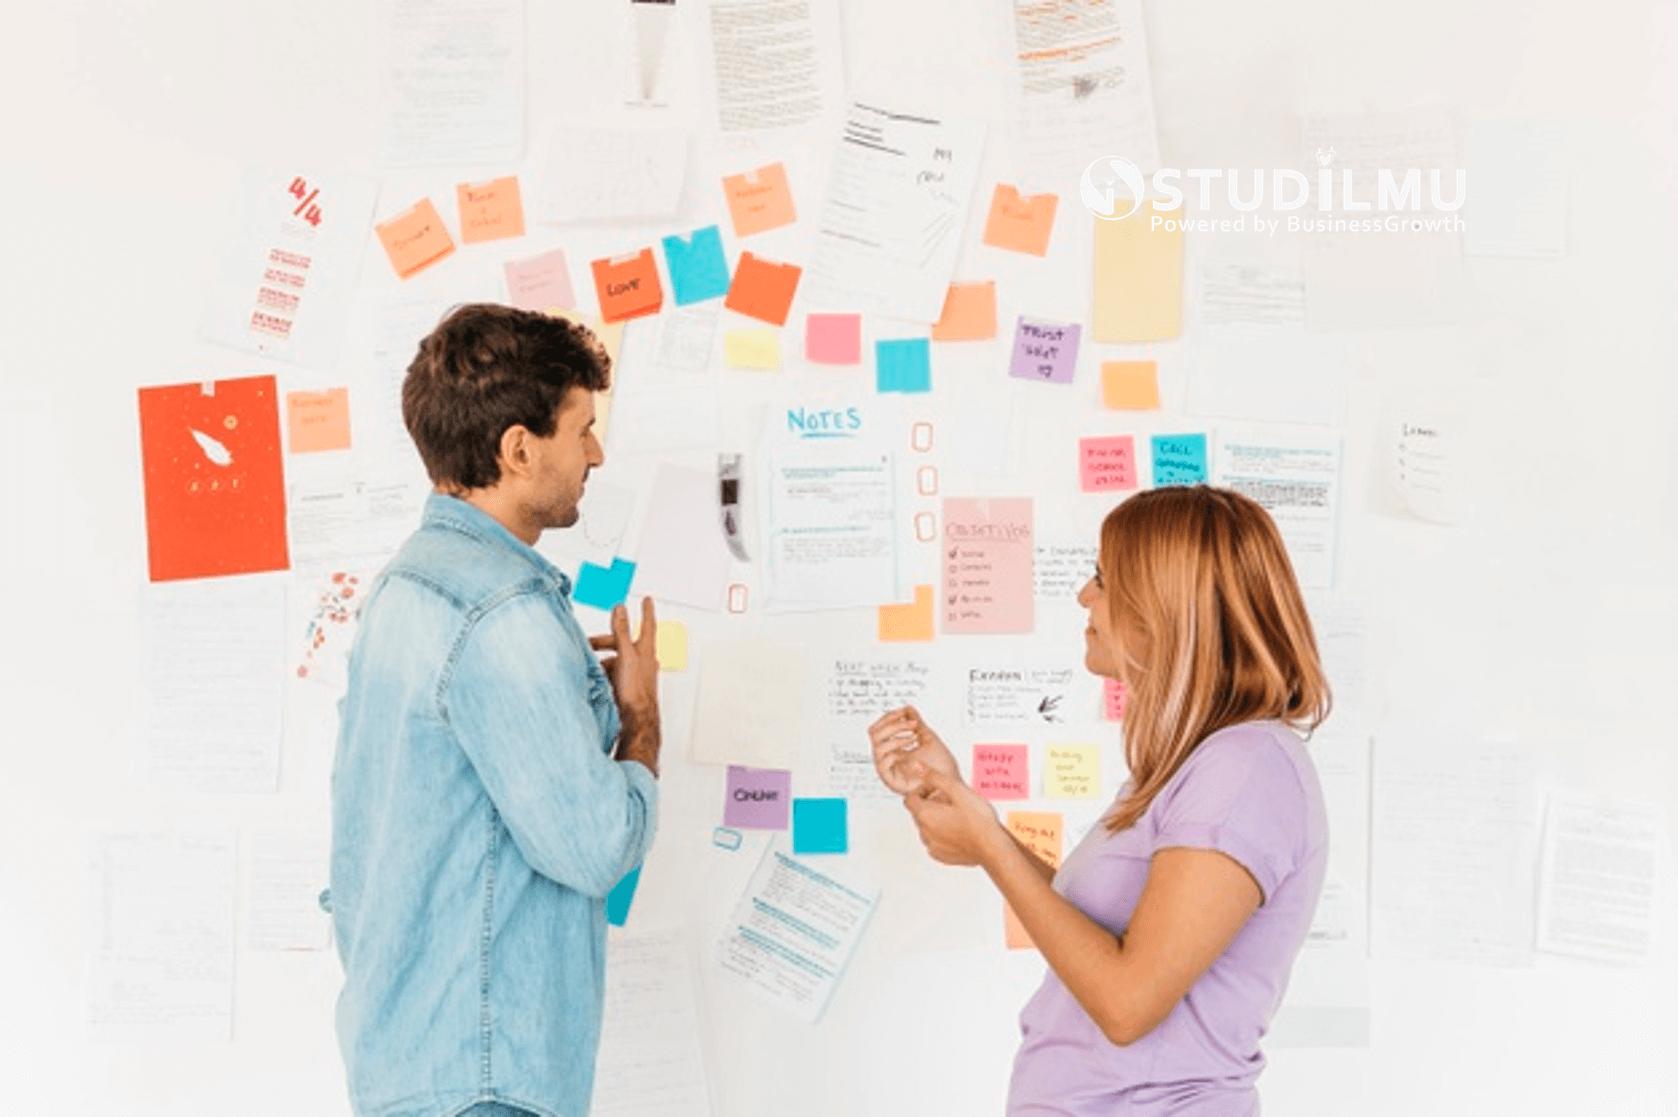 Cara Menetapkan Pengukuran Kinerja yang Benar